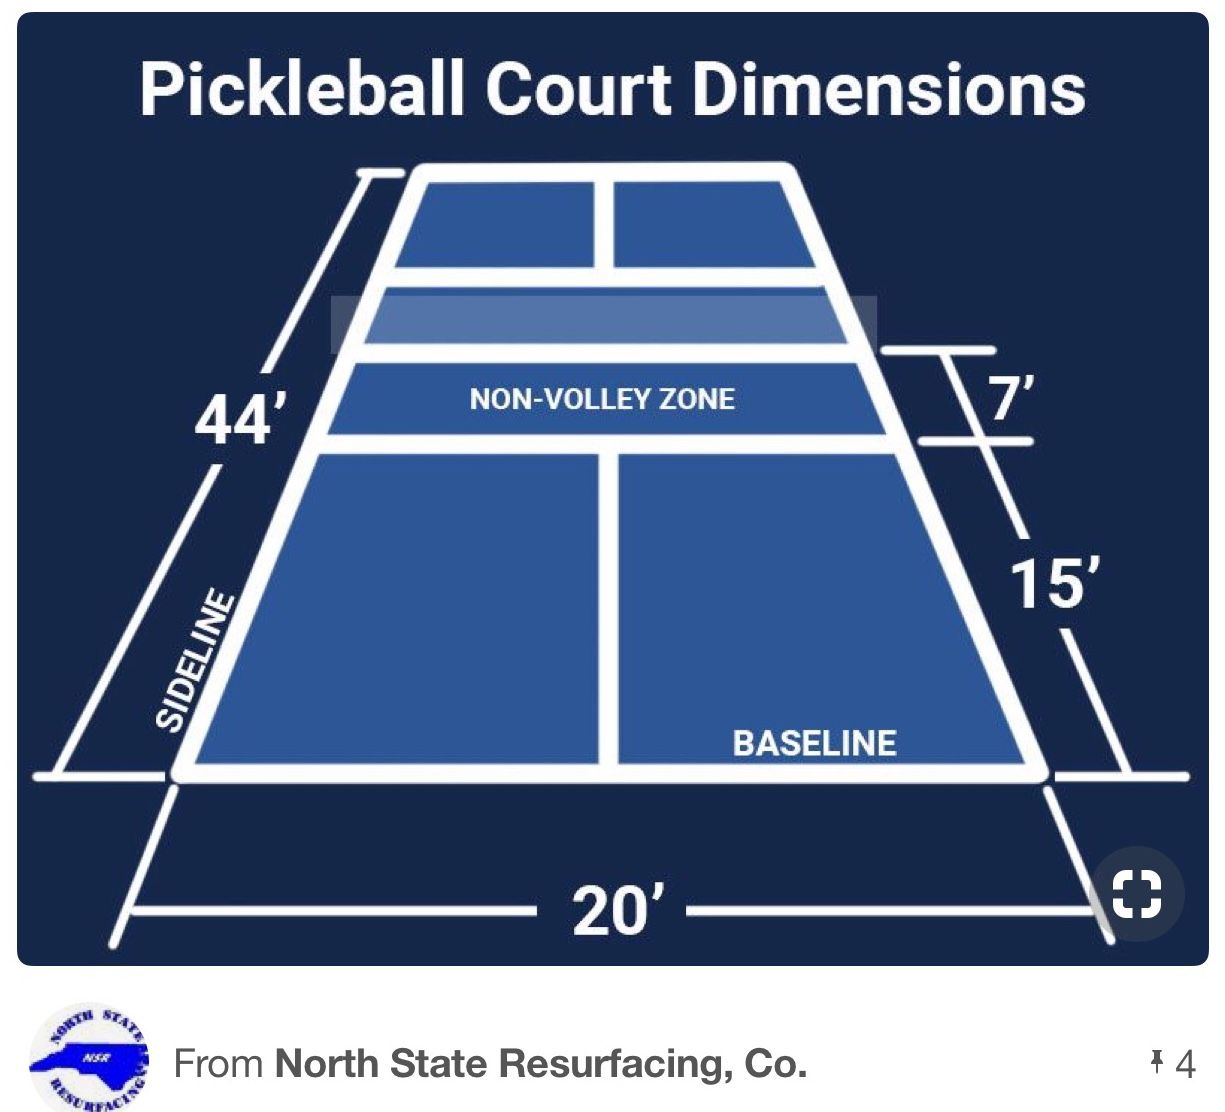 Pin by Linda Dunning on Pickleball Pickleball court